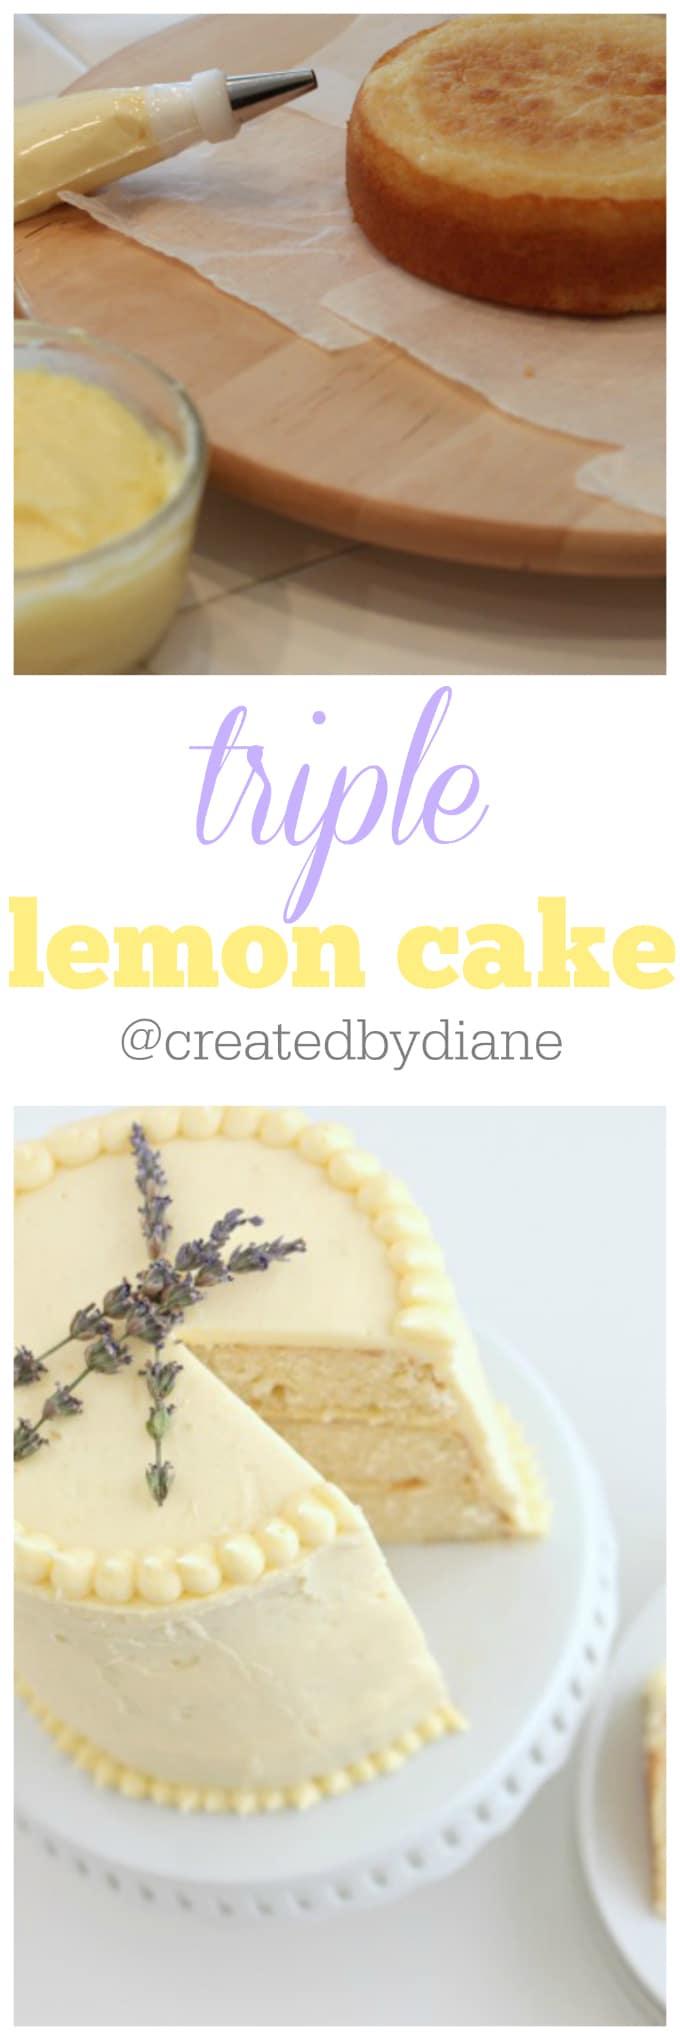 triple lemon cake recipe and instructions from @createdbydiane